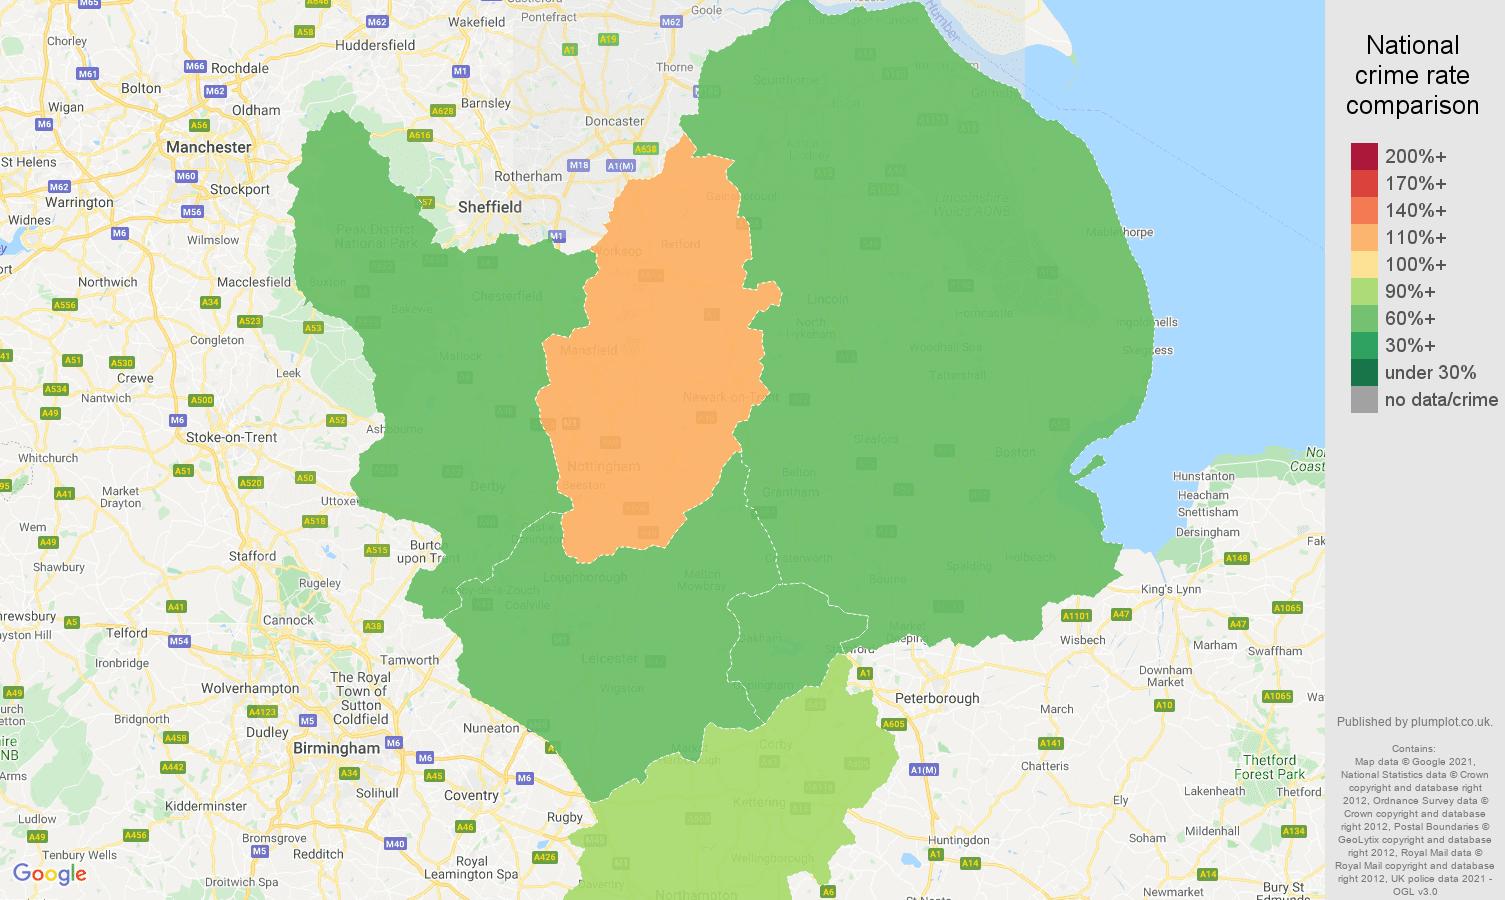 East Midlands drugs crime rate comparison map